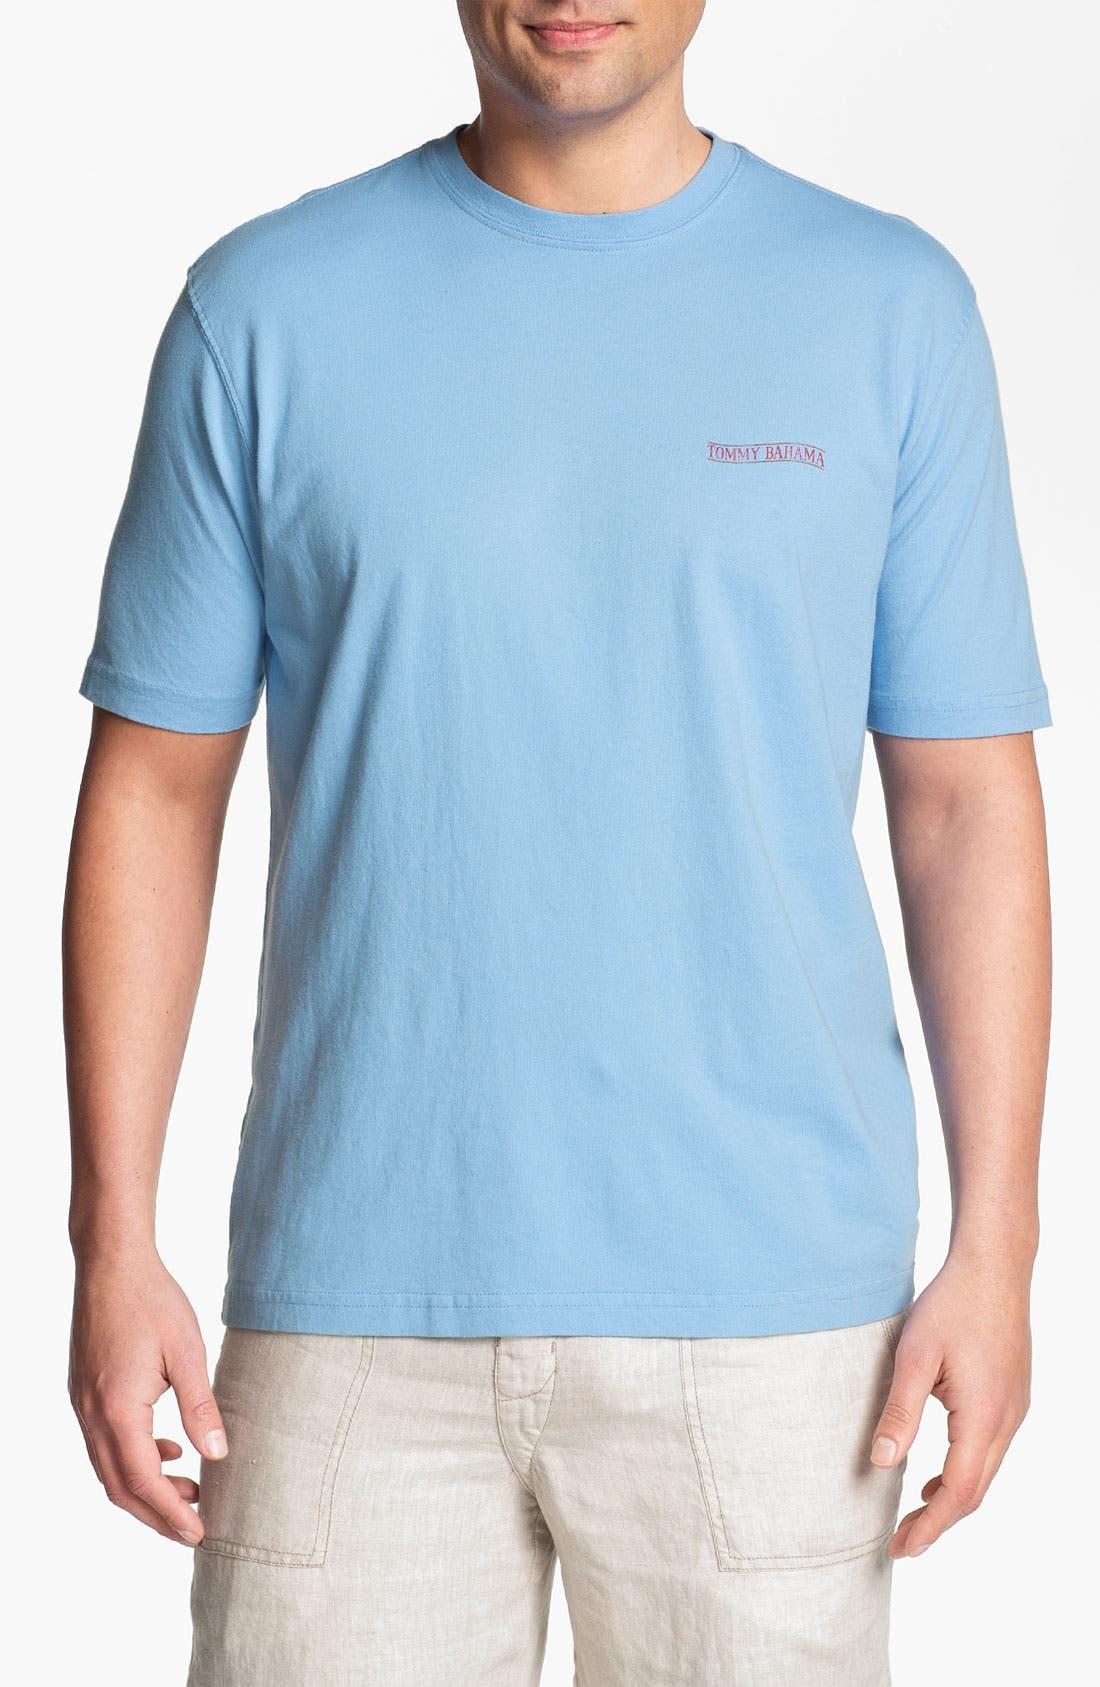 Main Image - Tommy Bahama 'Open Bottle, Open Mind' T-Shirt